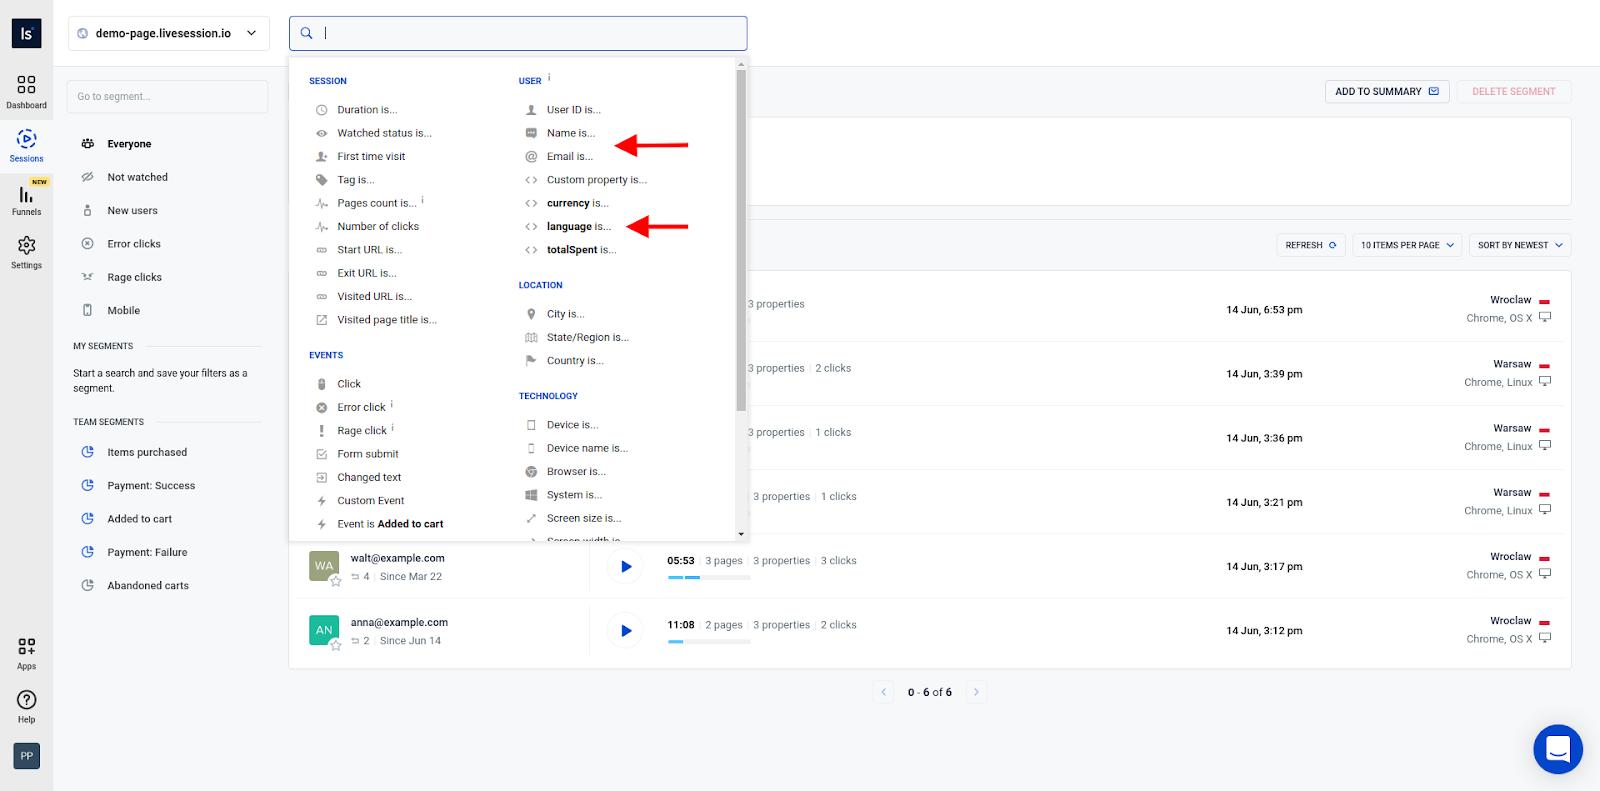 Adding custom properties and identify users